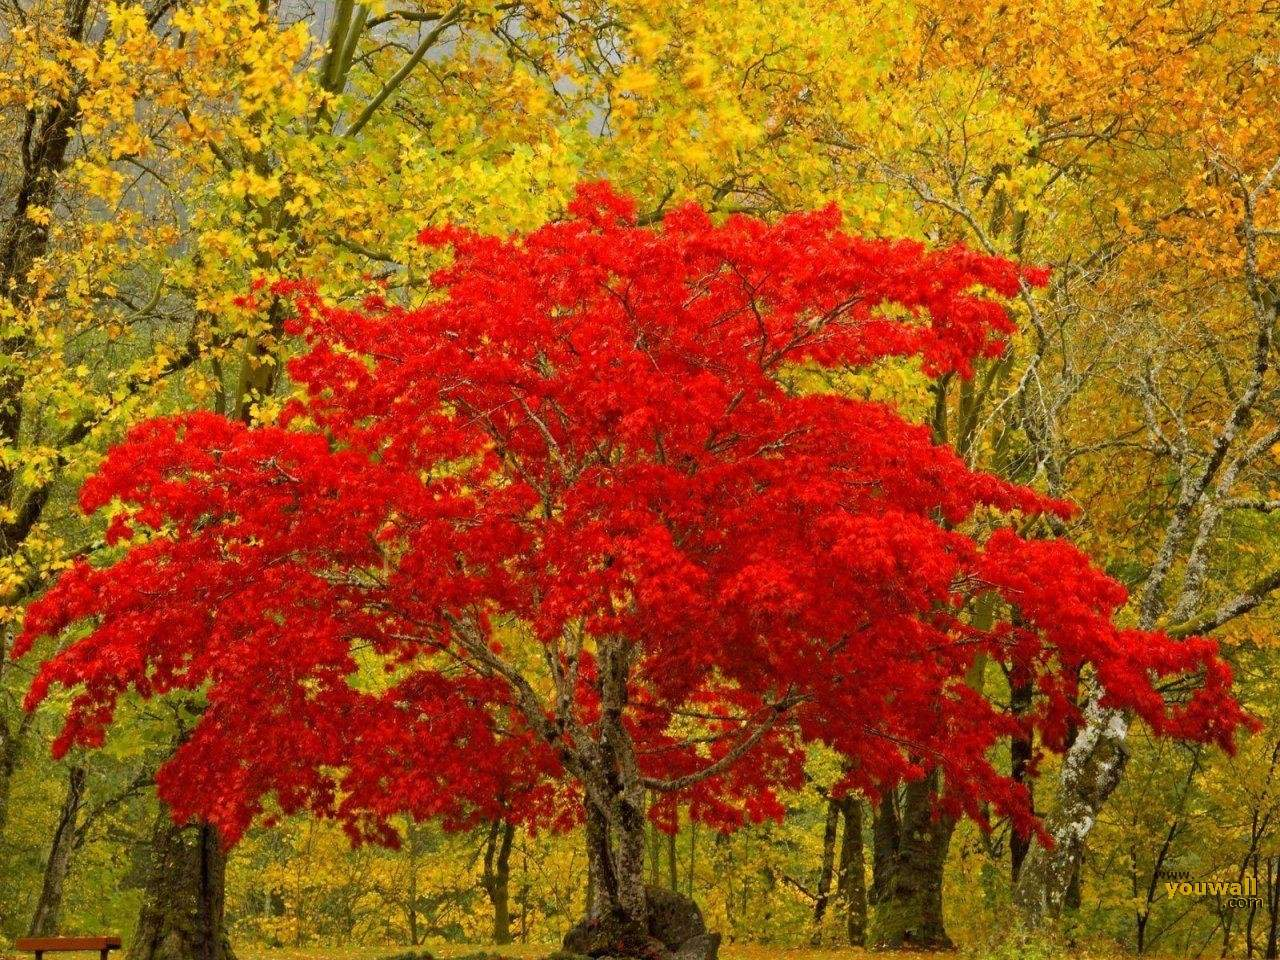 Wallpaper Red Trees | Free Download Wallpaper | DaWallpaperz